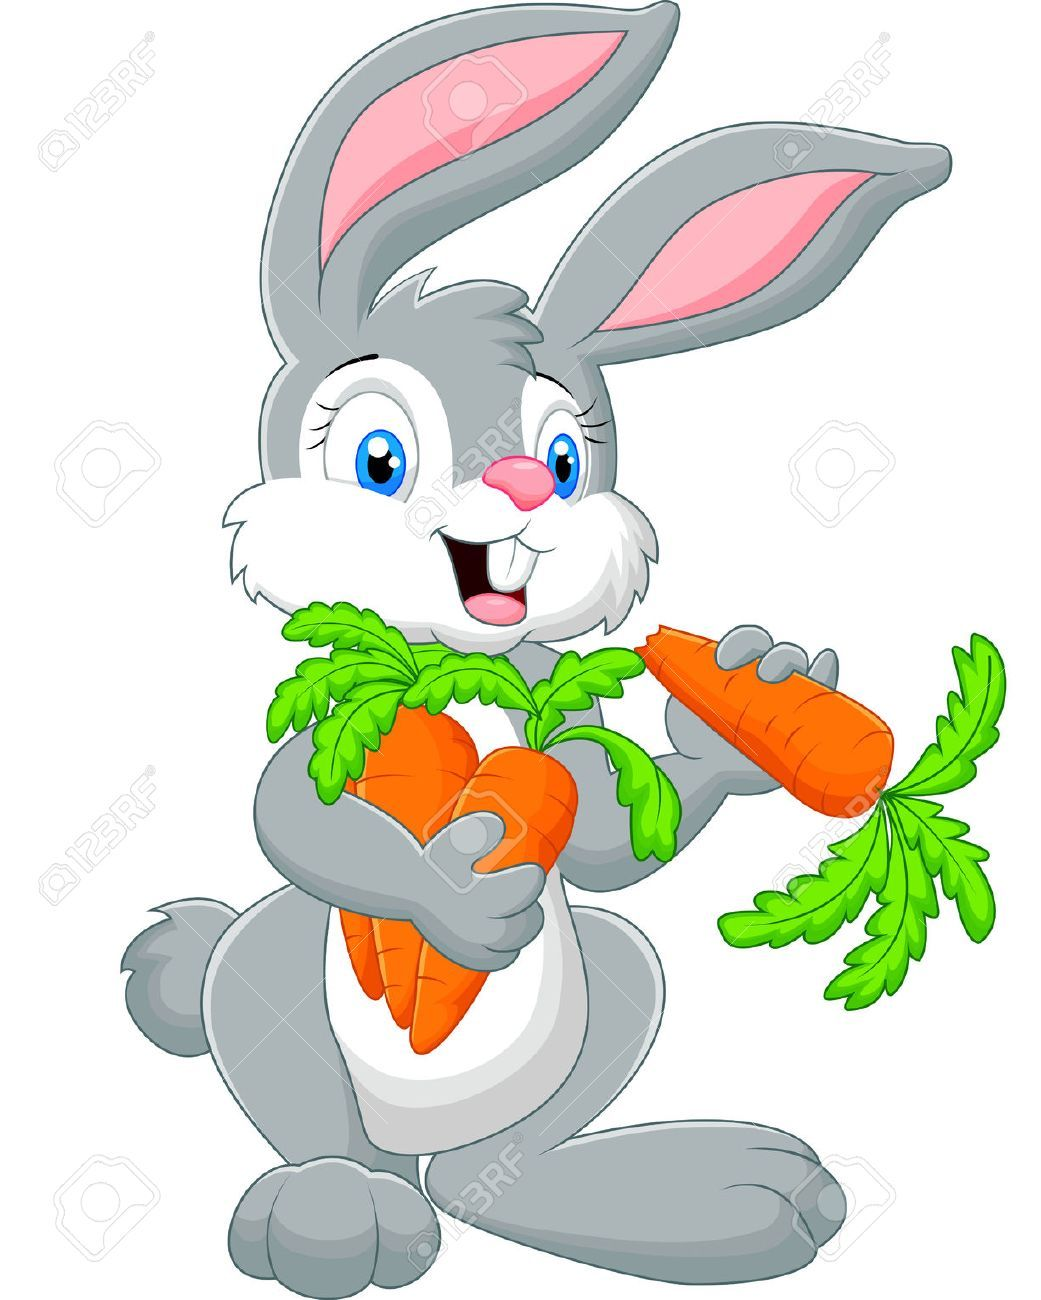 Cartoon Rabbit Holding A Carrot Ad Rabbit Cartoon Carrot Holding Rabbit Cartoon Cute Bunny Cartoon Rabbit Colors